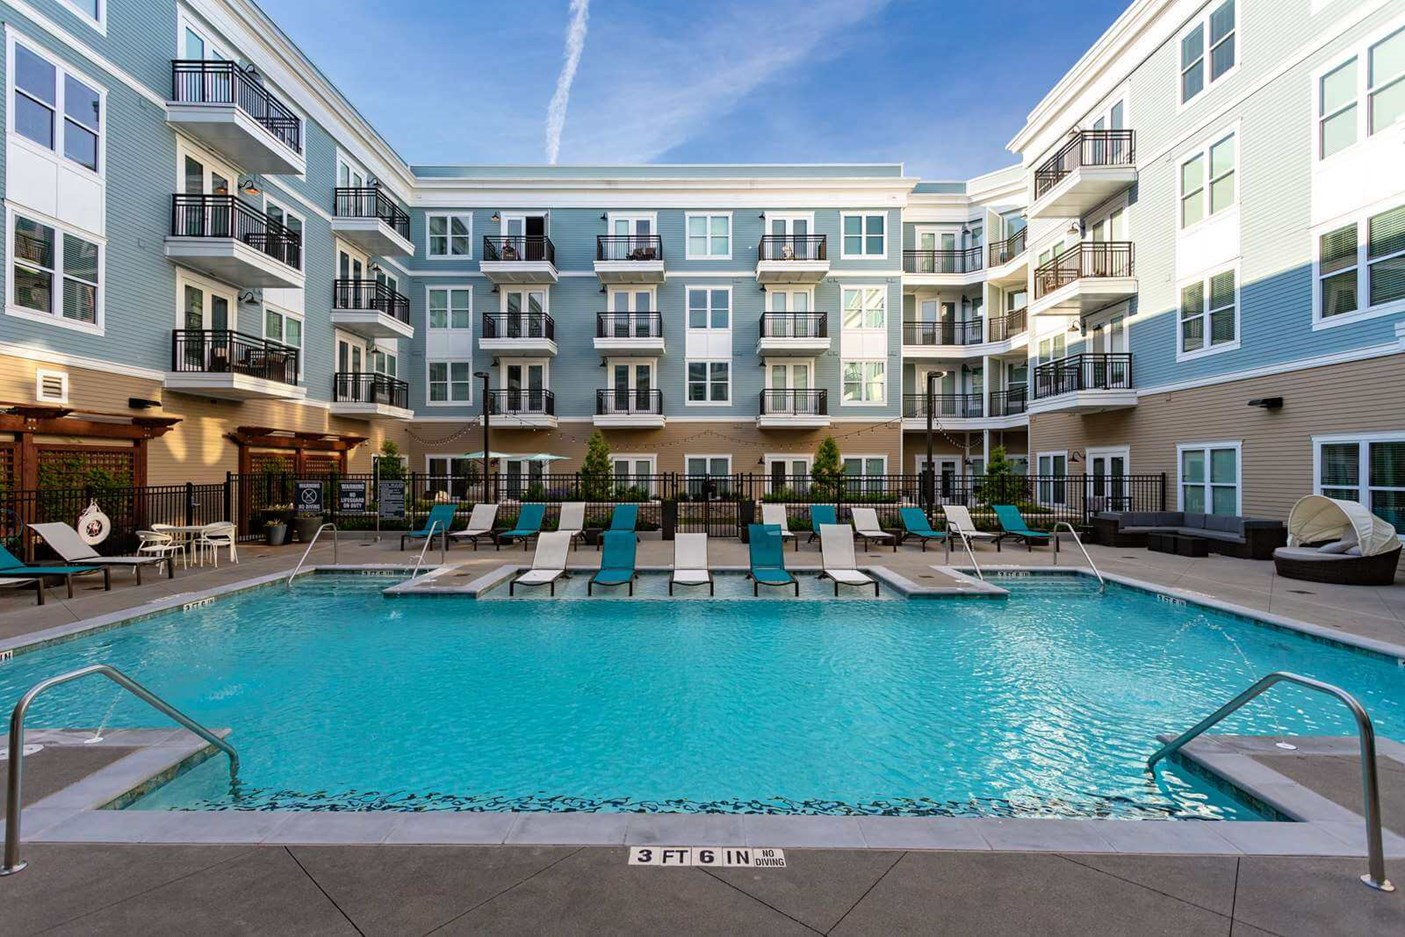 Photo of Amorance pool